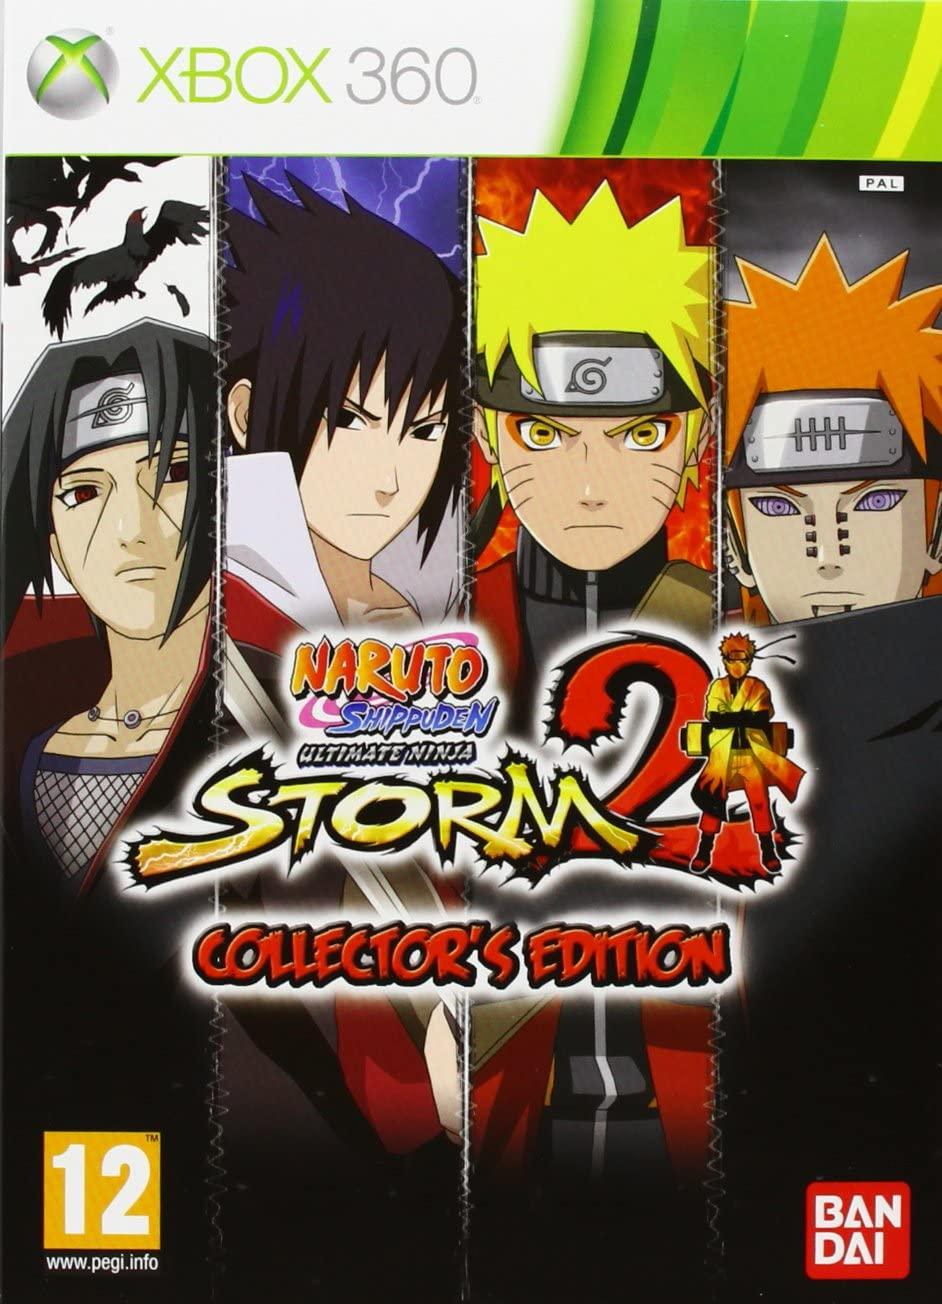 XBOX360 Naruto Shippuden Ultimate Ninja Storm 2 Collector|Game Deals